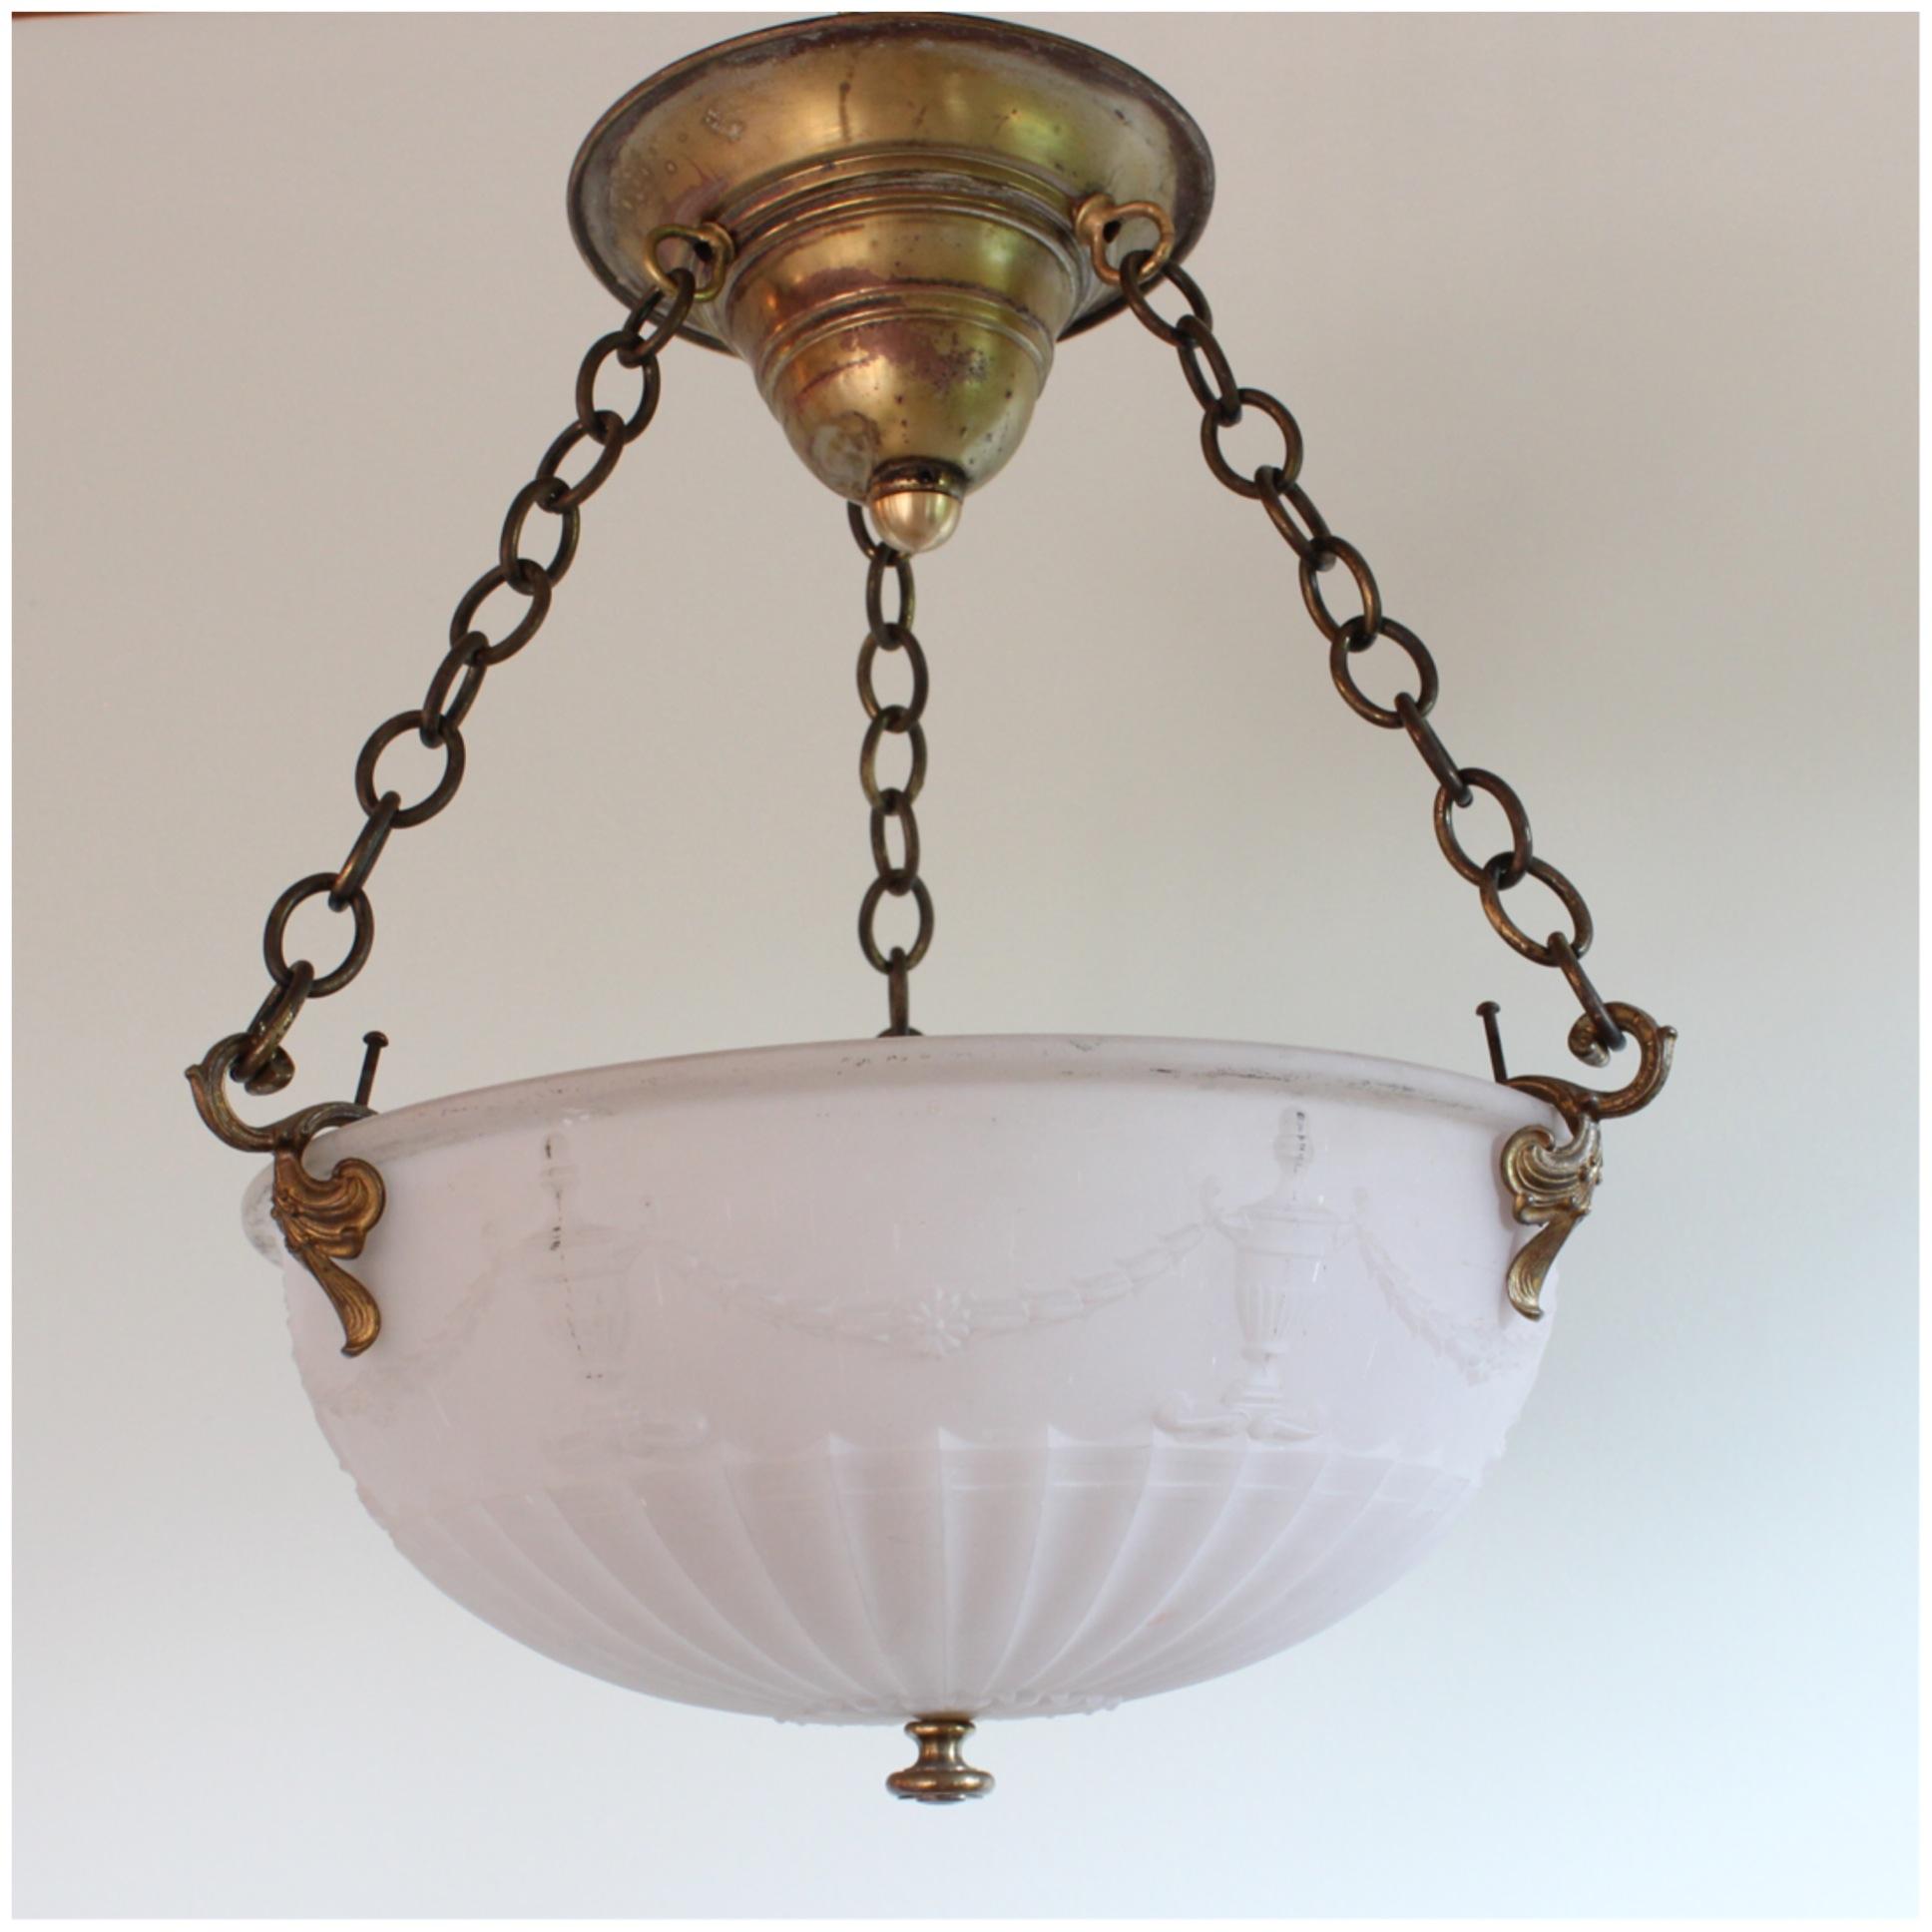 Diy103 camphor glass bowl light bogart bremmer bradley antiques diy103 camphor glass bowl light mozeypictures Gallery